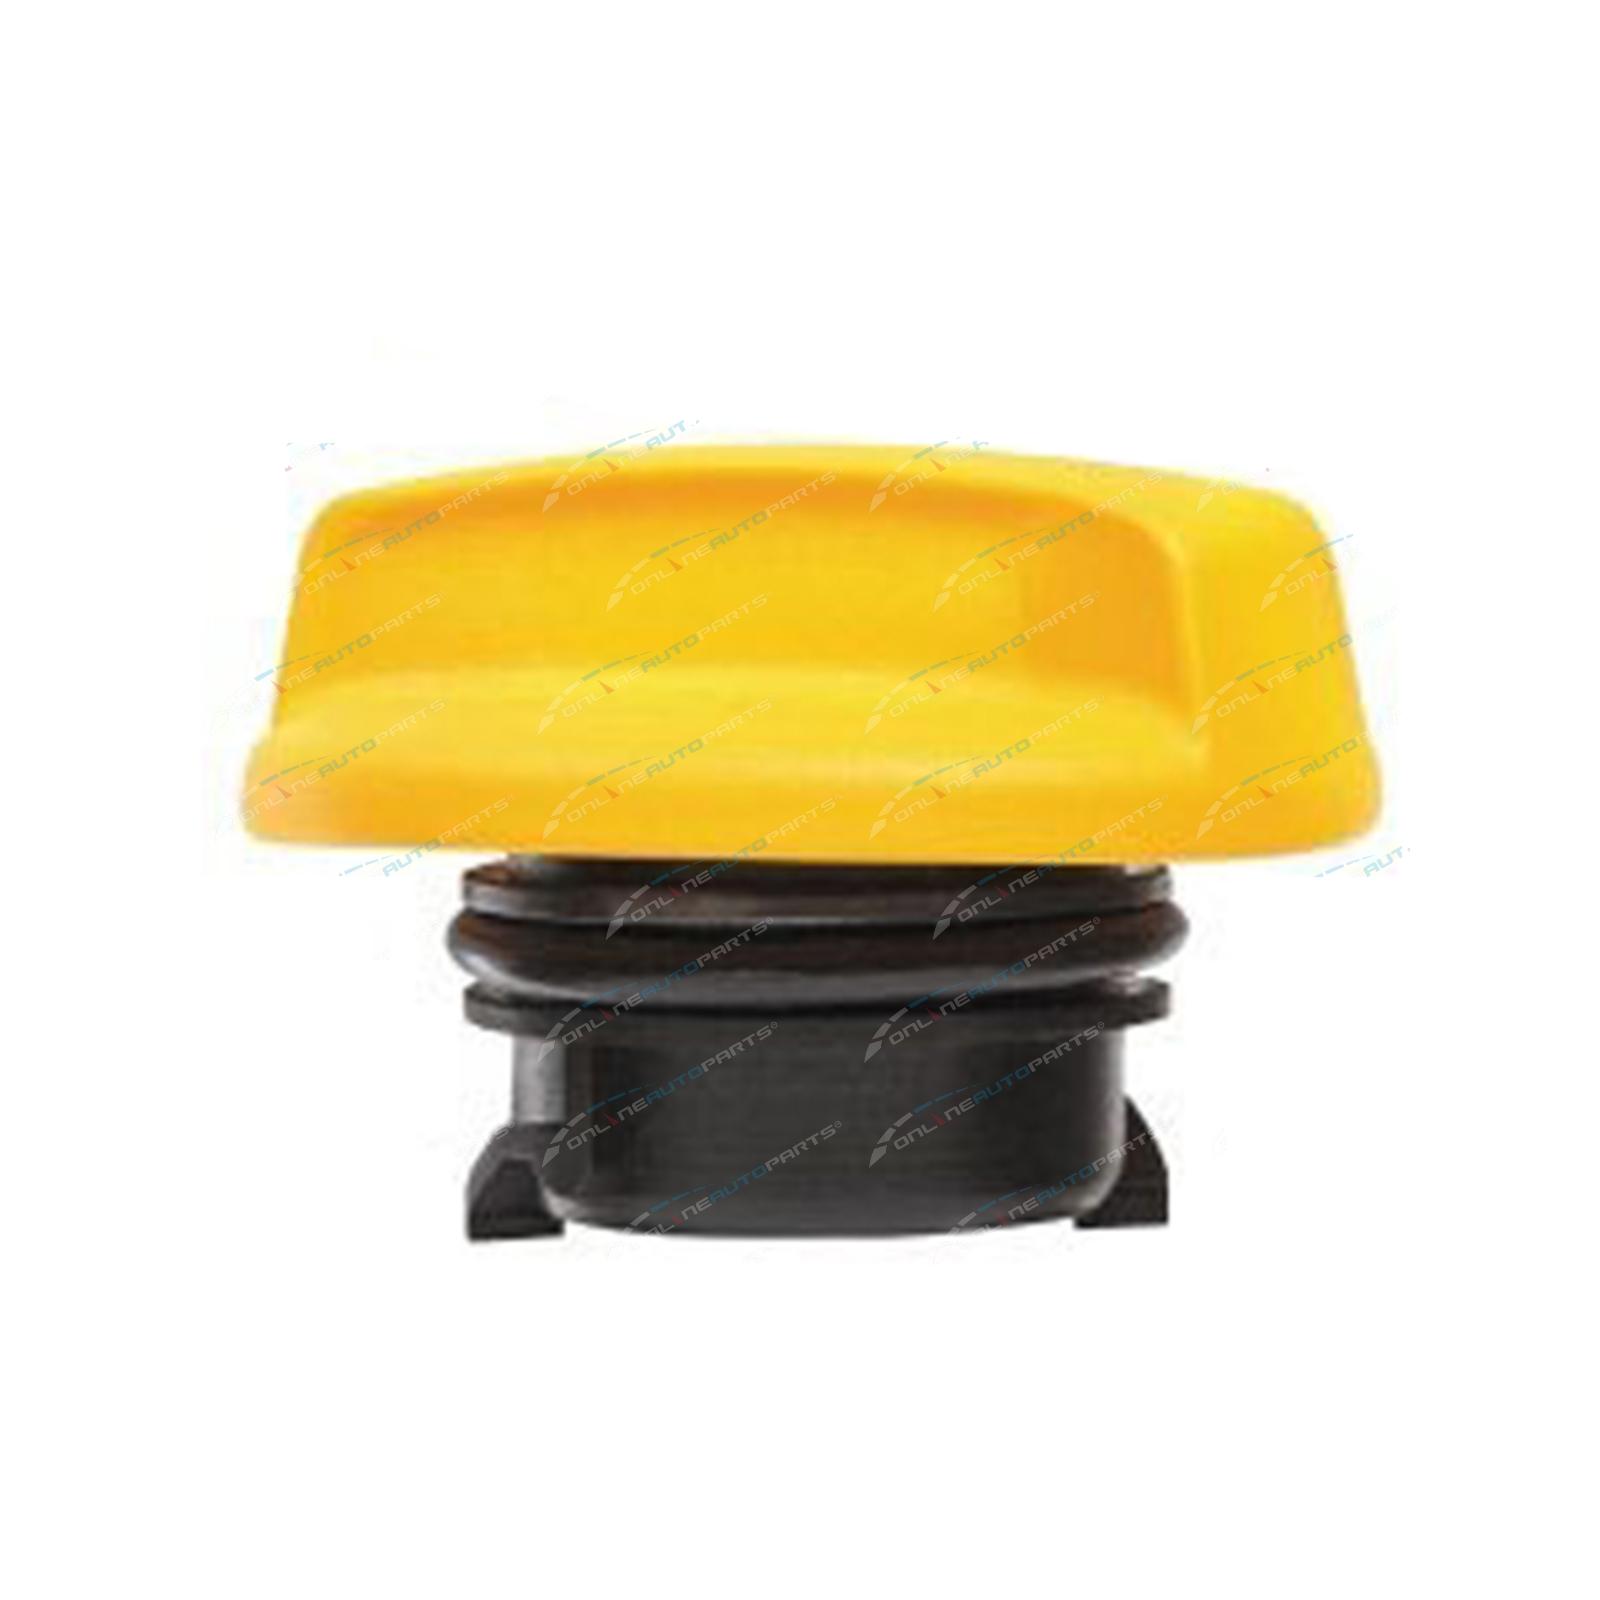 TOC547 - Engine Oil Cap Plastic push & turn - Tridon